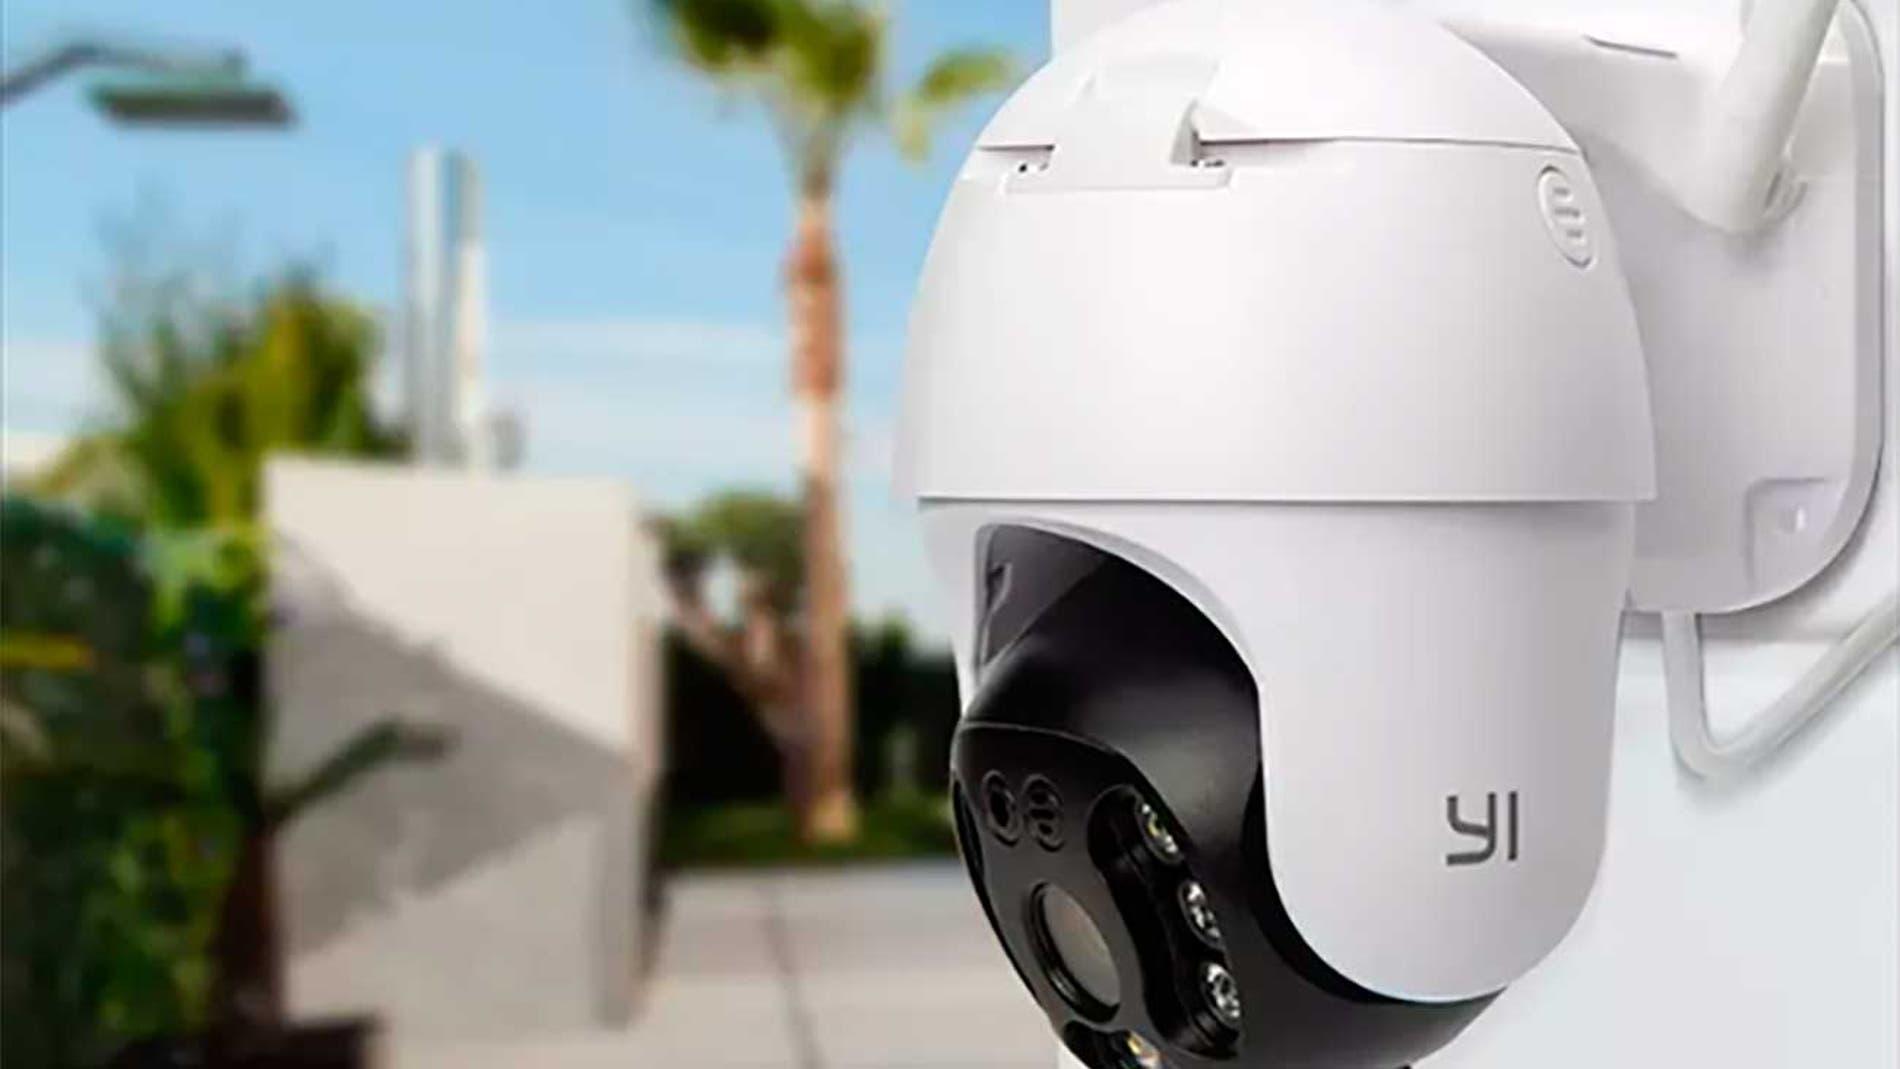 YI Smart camera Outdoor PTZ